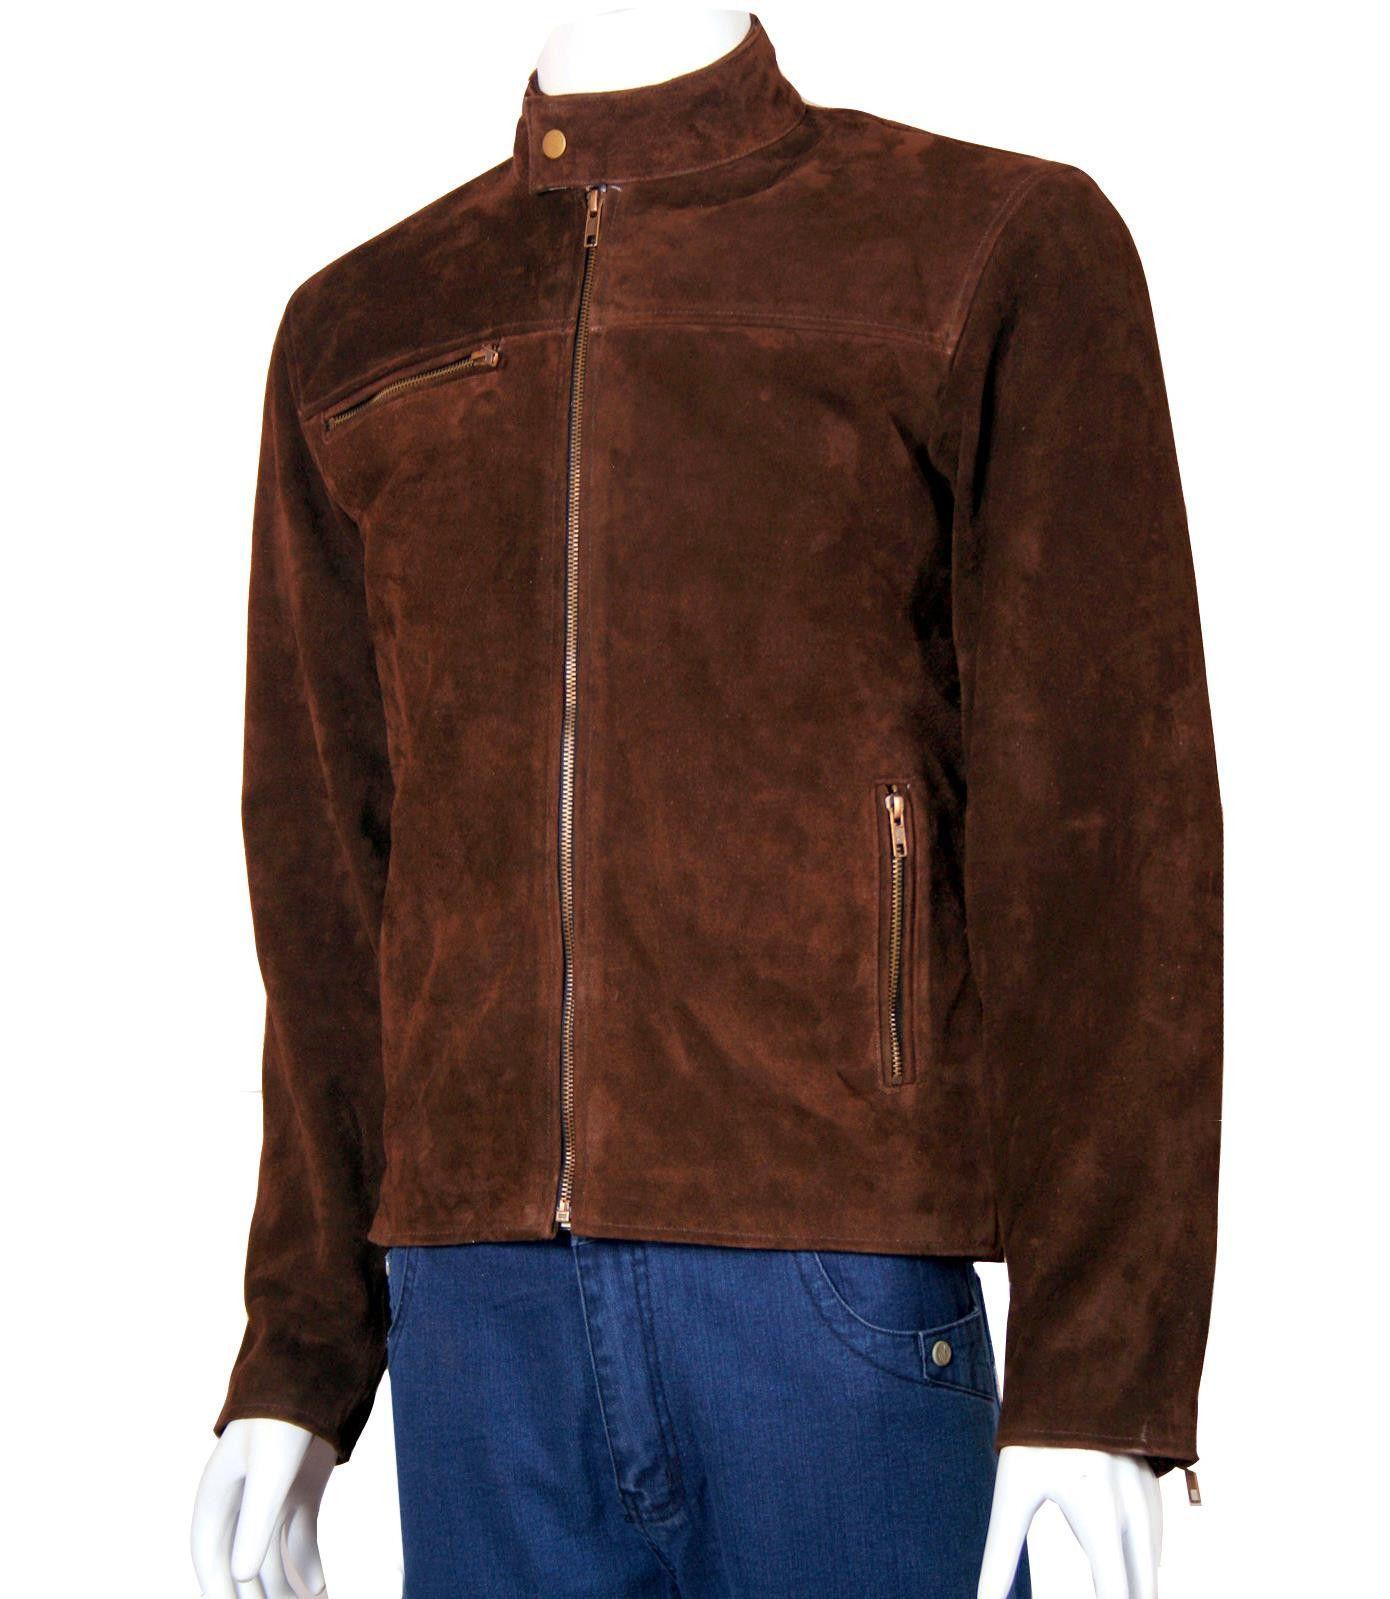 Tom Cruise Suede Leather Jacket